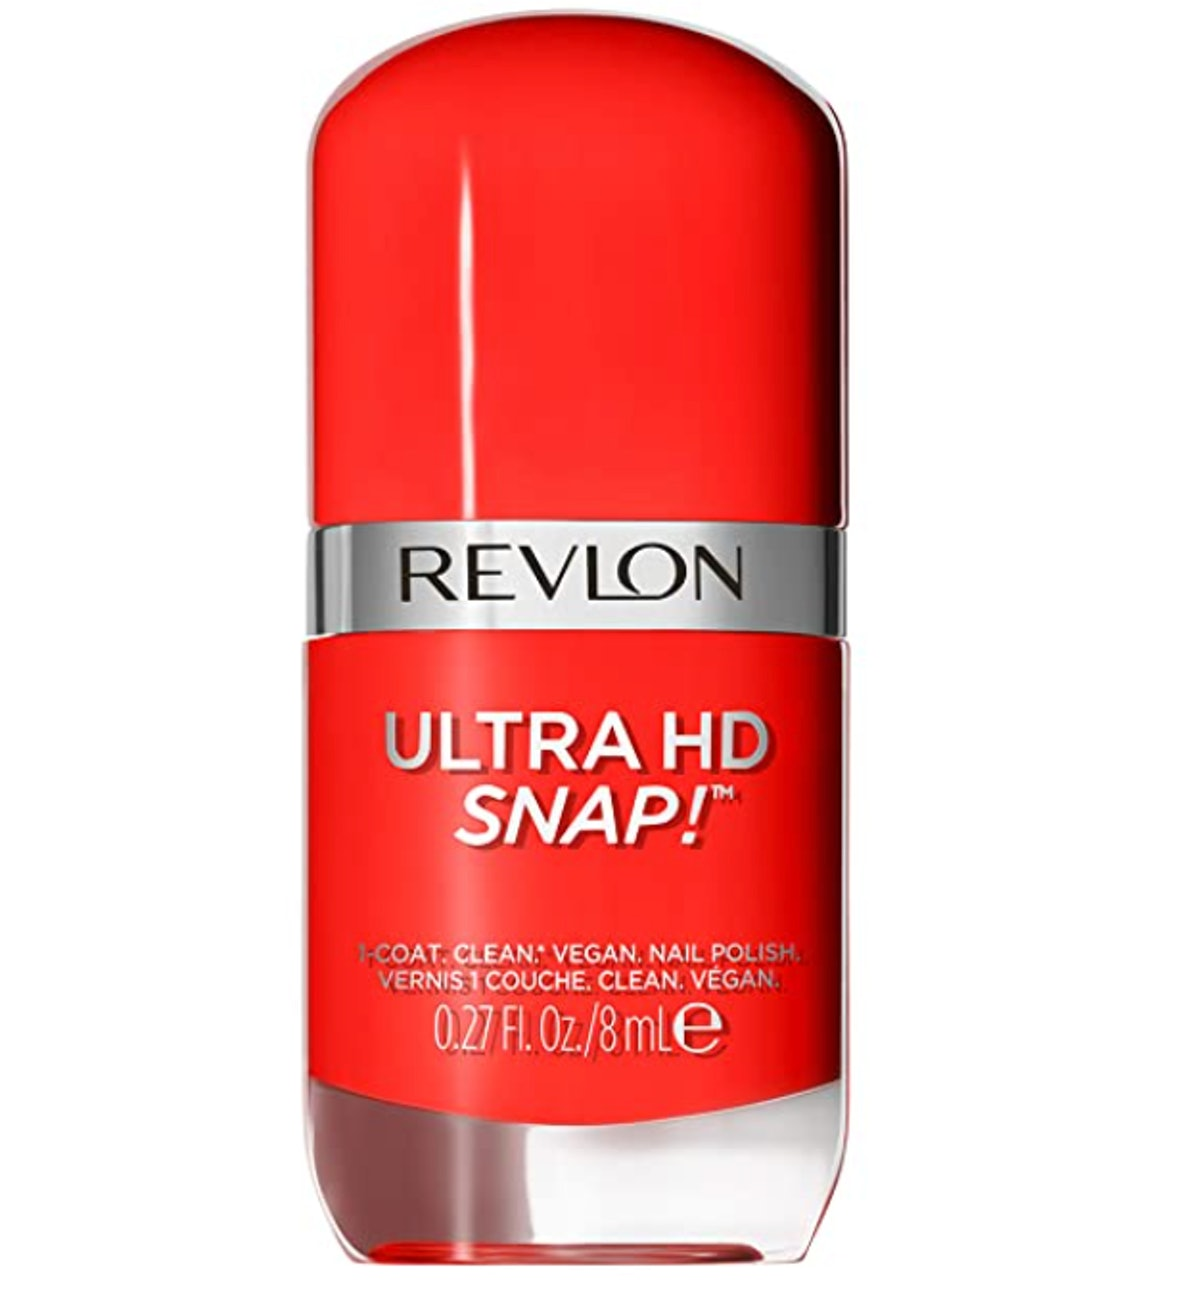 REVLON Ultra HD Snap Nail Polish